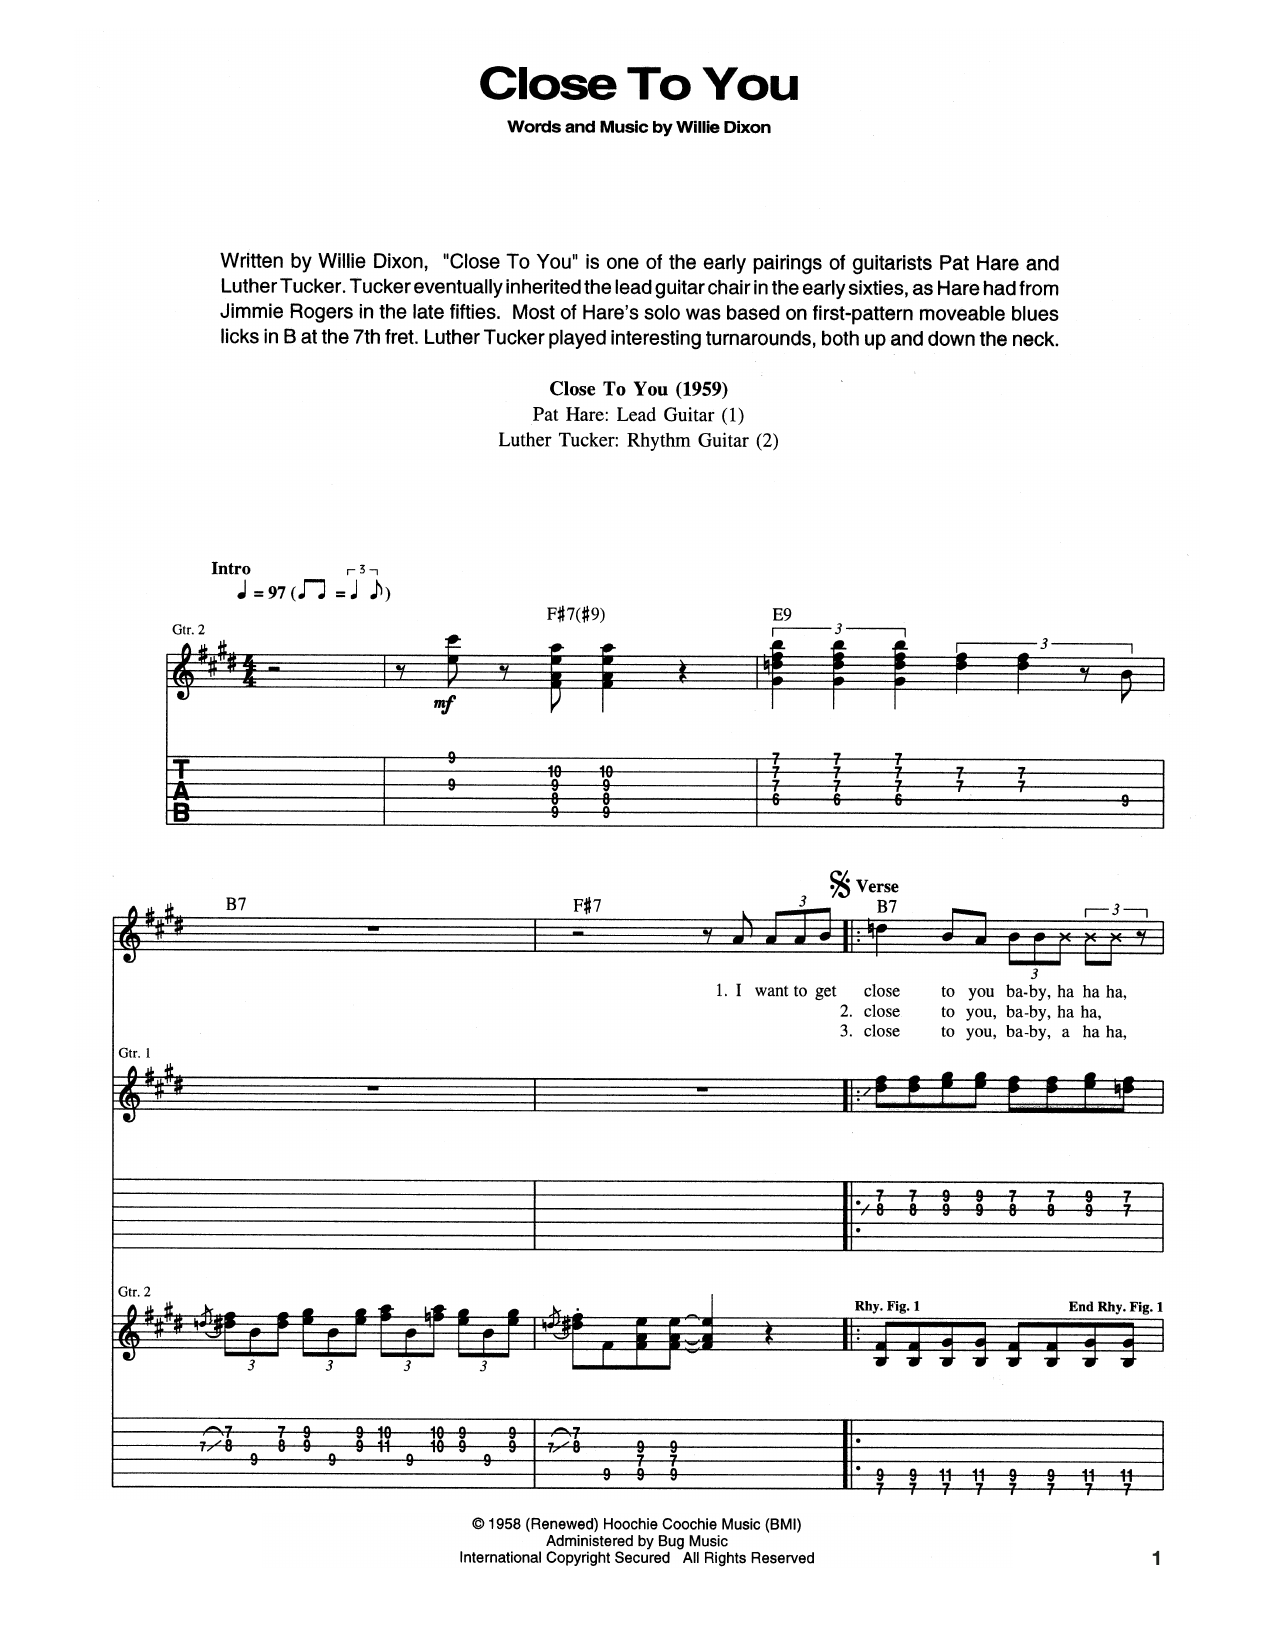 Muddy Waters 'Close To You (I Wanna Get)' Sheet Music Notes, Chords |  Download Printable Guitar Tab - SKU: 173291